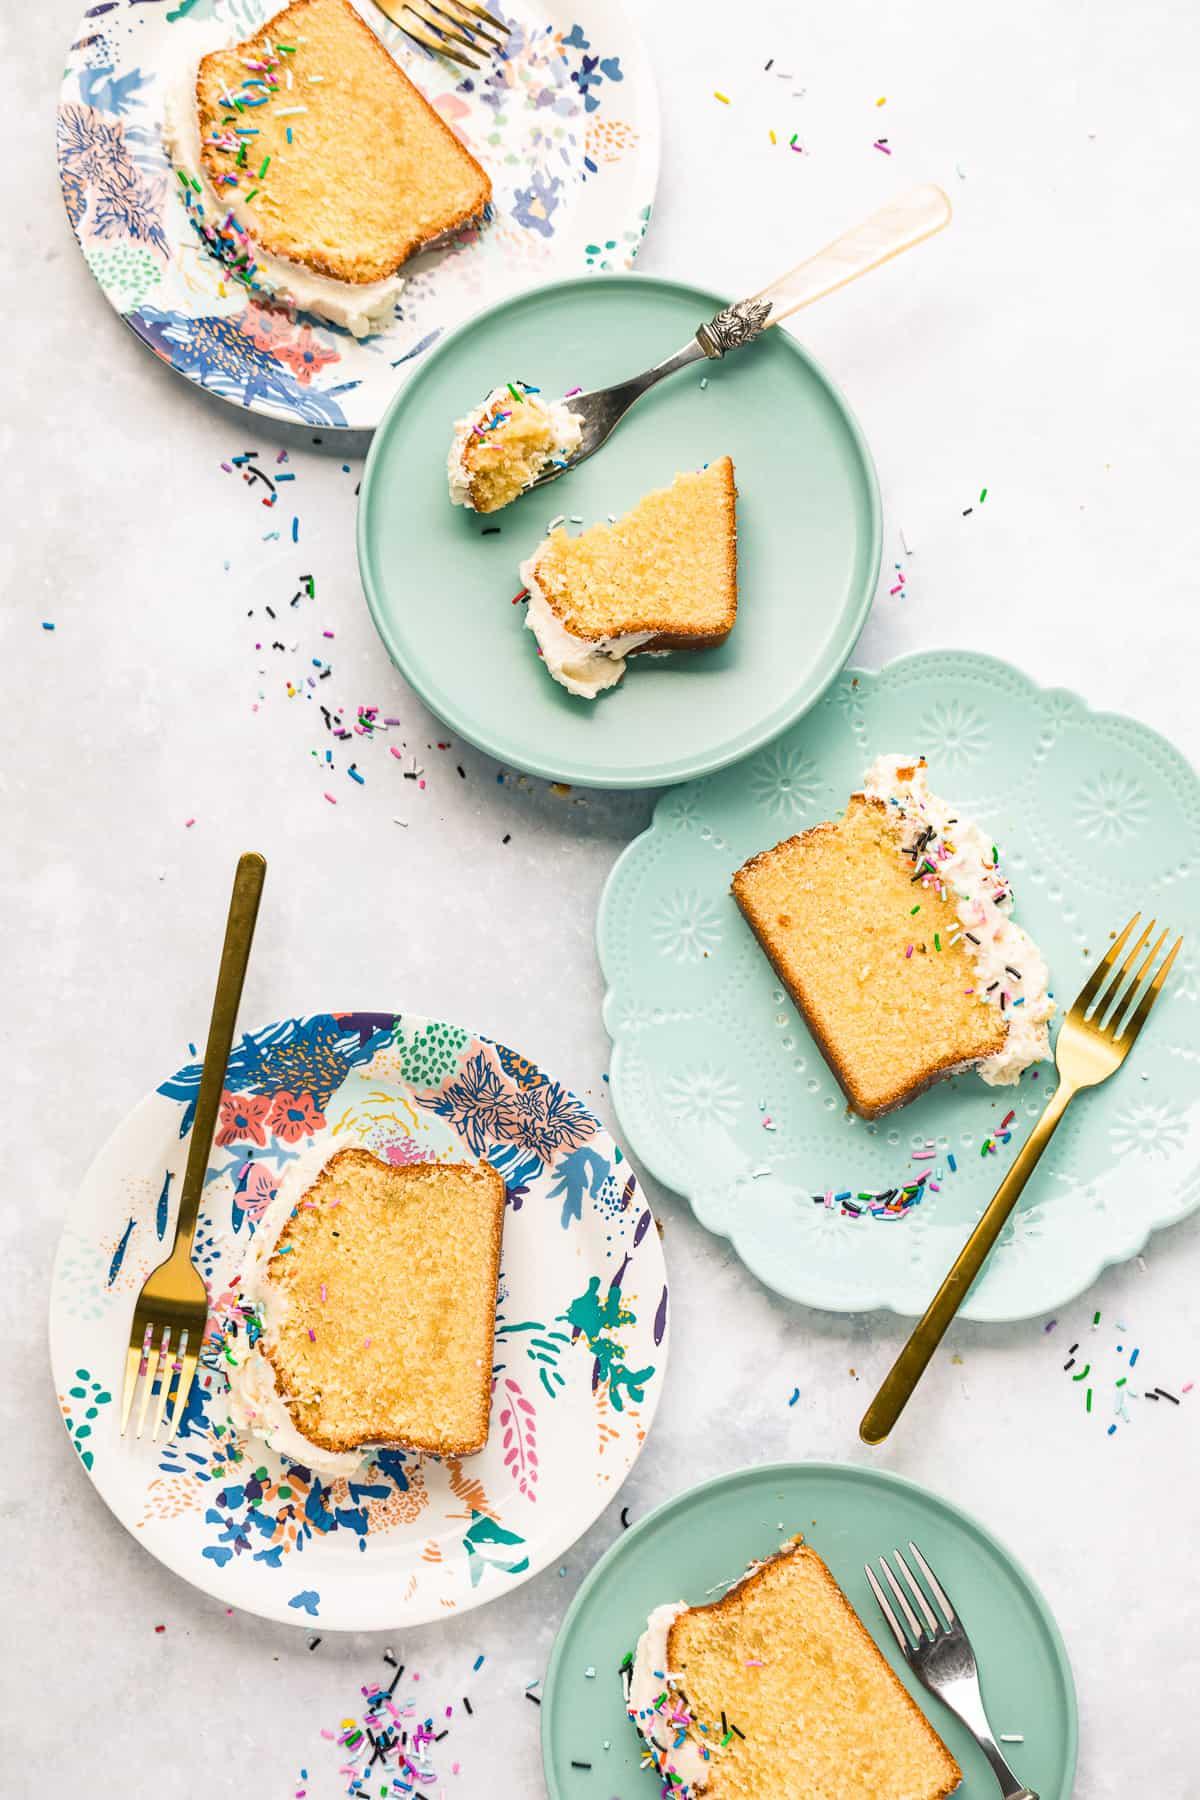 Slices of moist vanilla loaf cake.